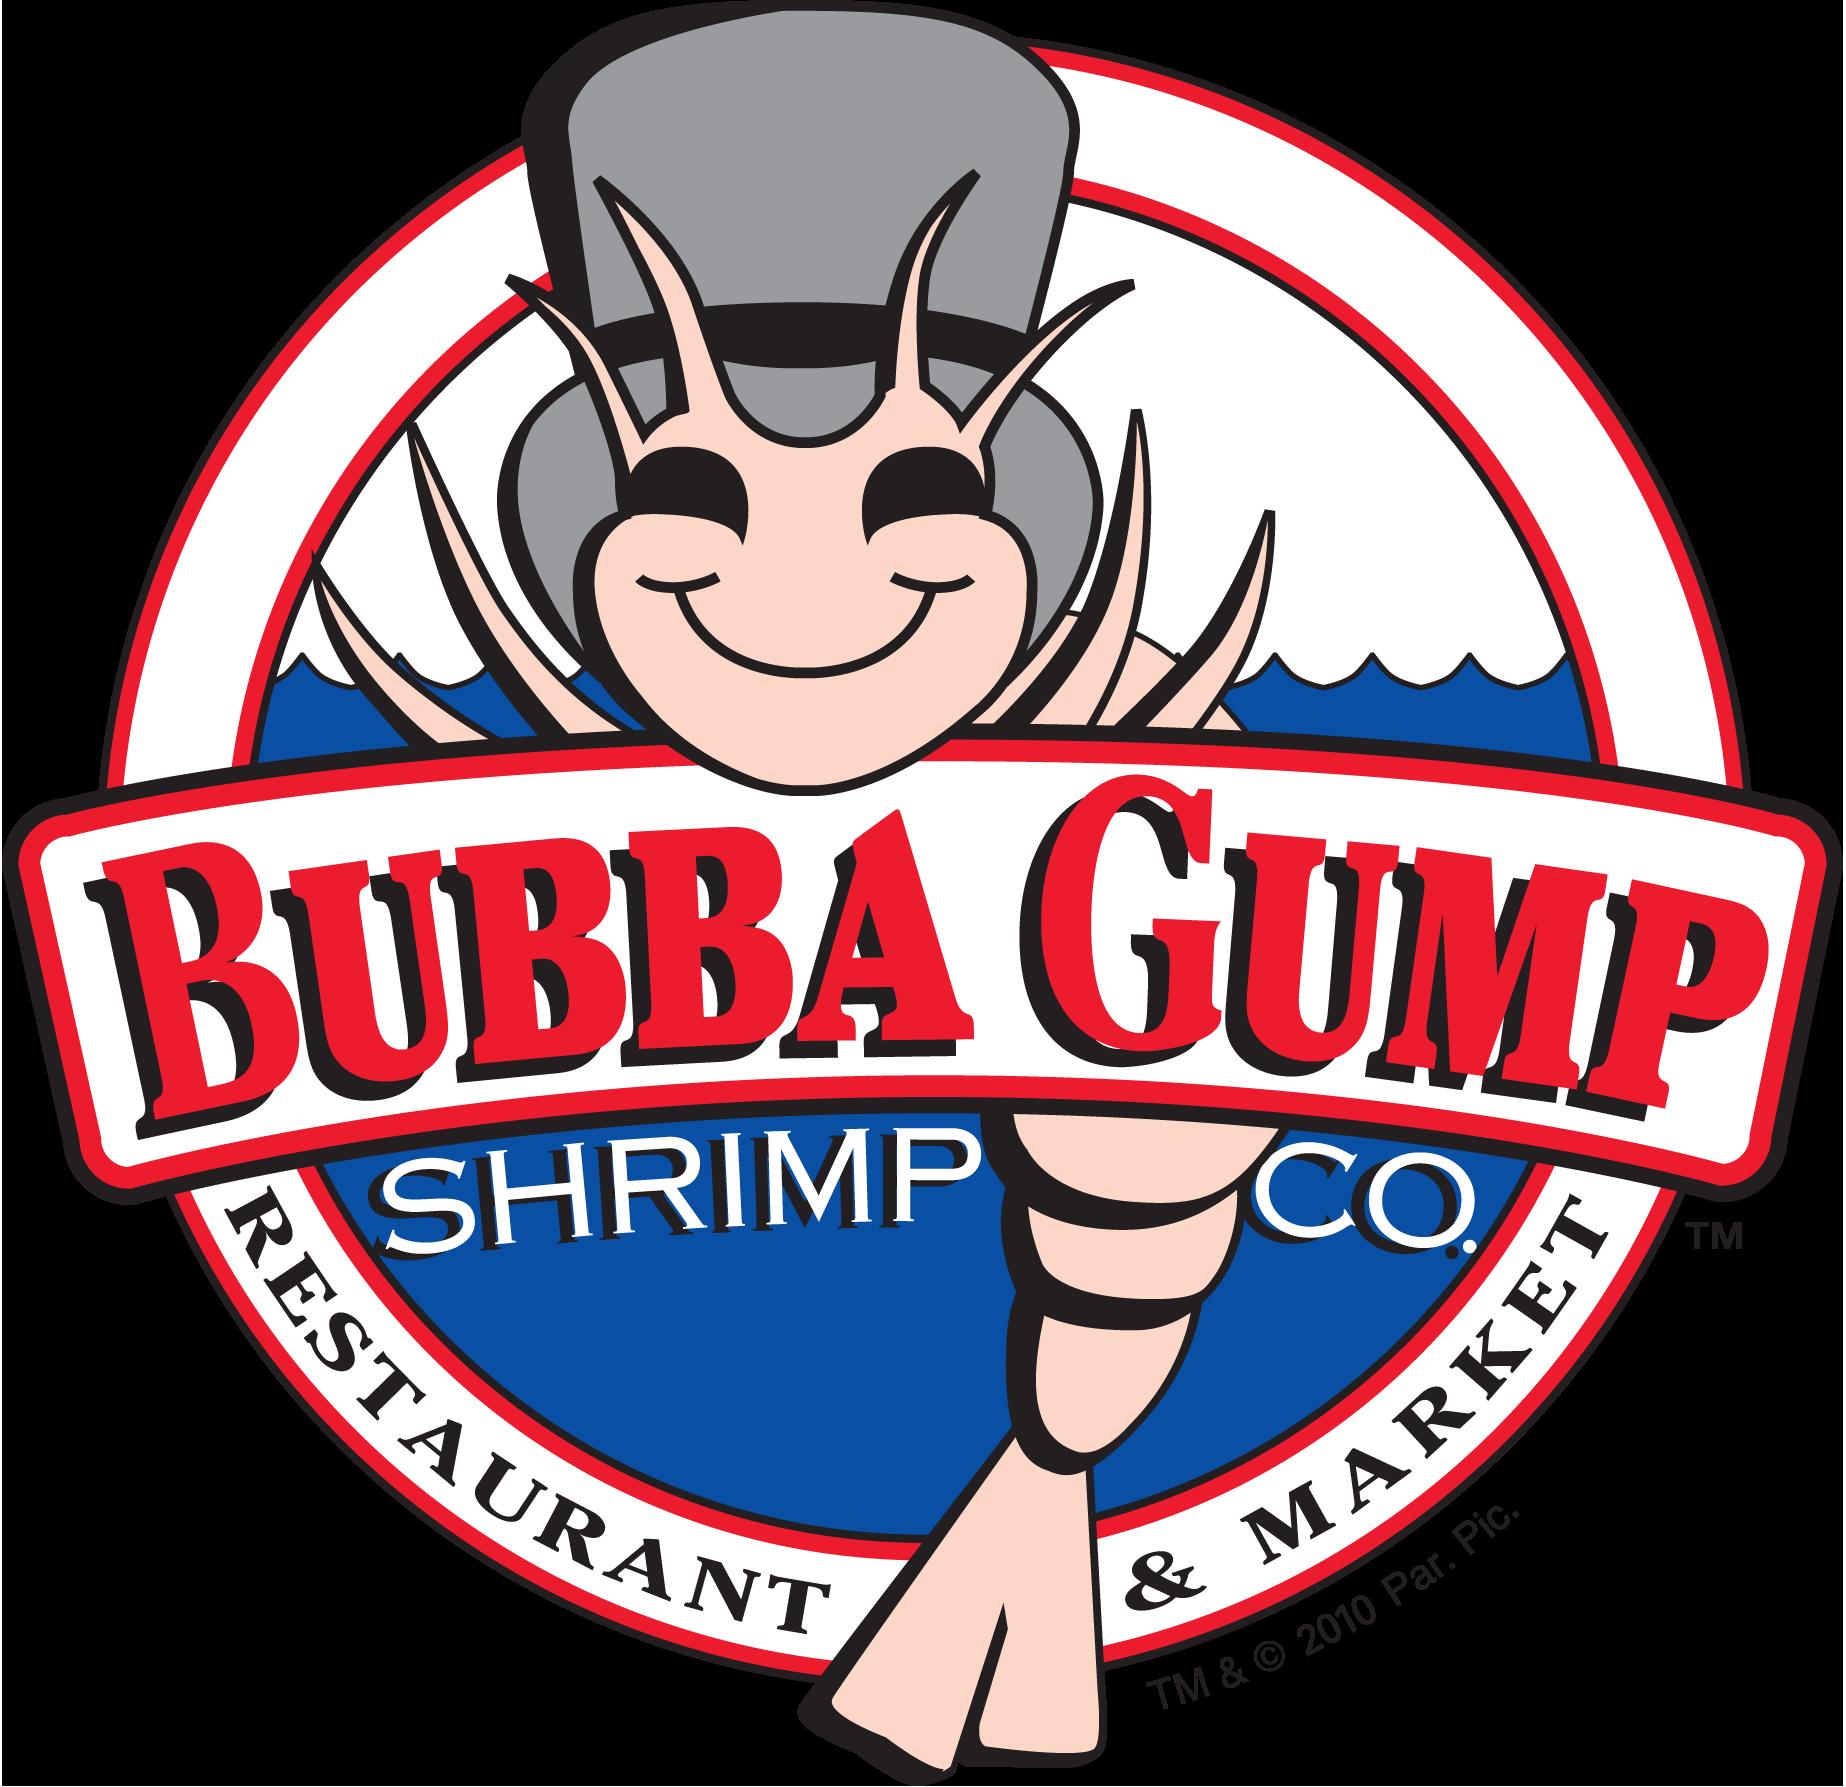 Bubba gump shrimp logo clipart.